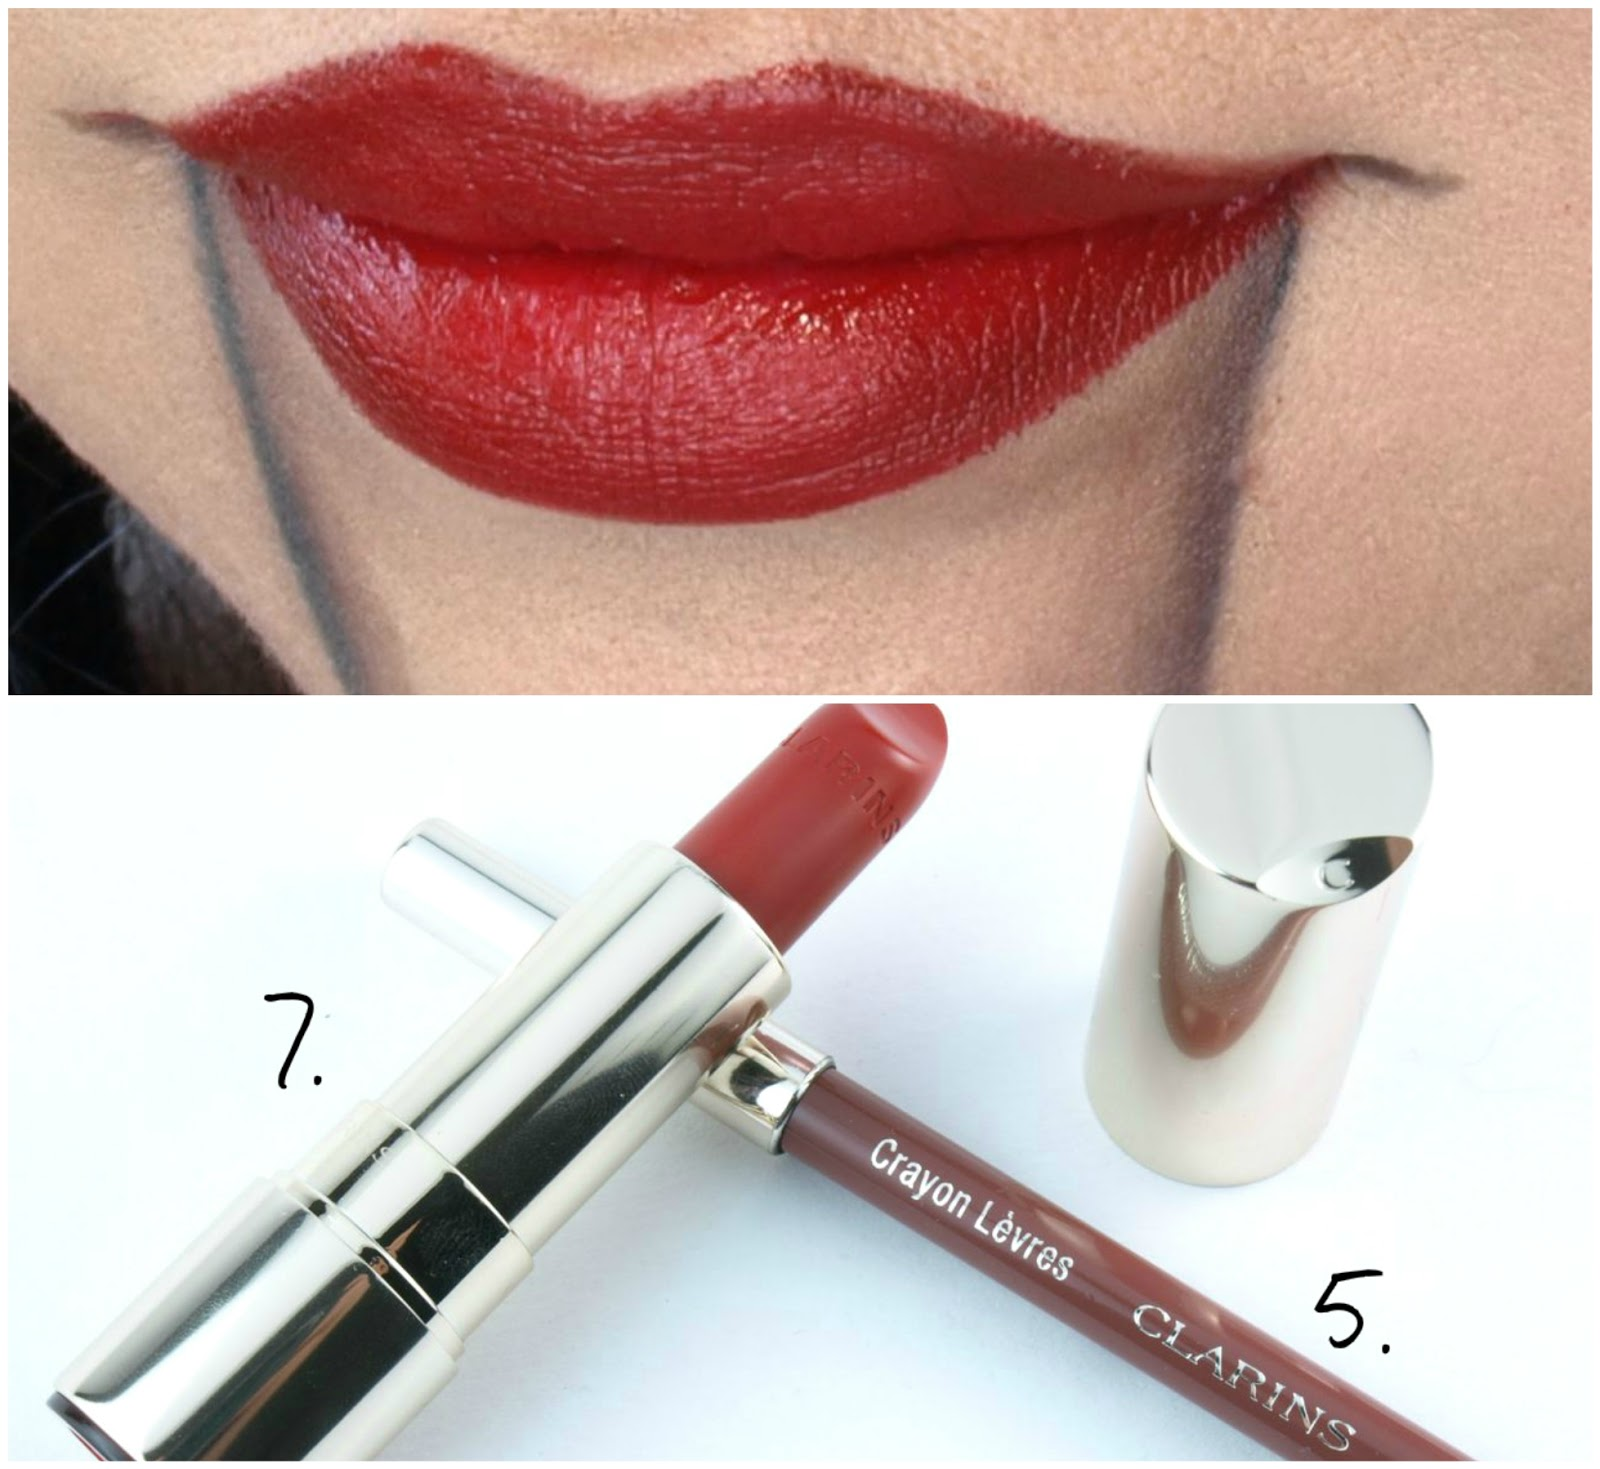 Sugar Rush Lipstick 03 Cherry Bomb 38 Gr Referensi Daftar Harga Cookie Dough 02 Emina 38gr Lipliner Pencil In Nude Rose 7